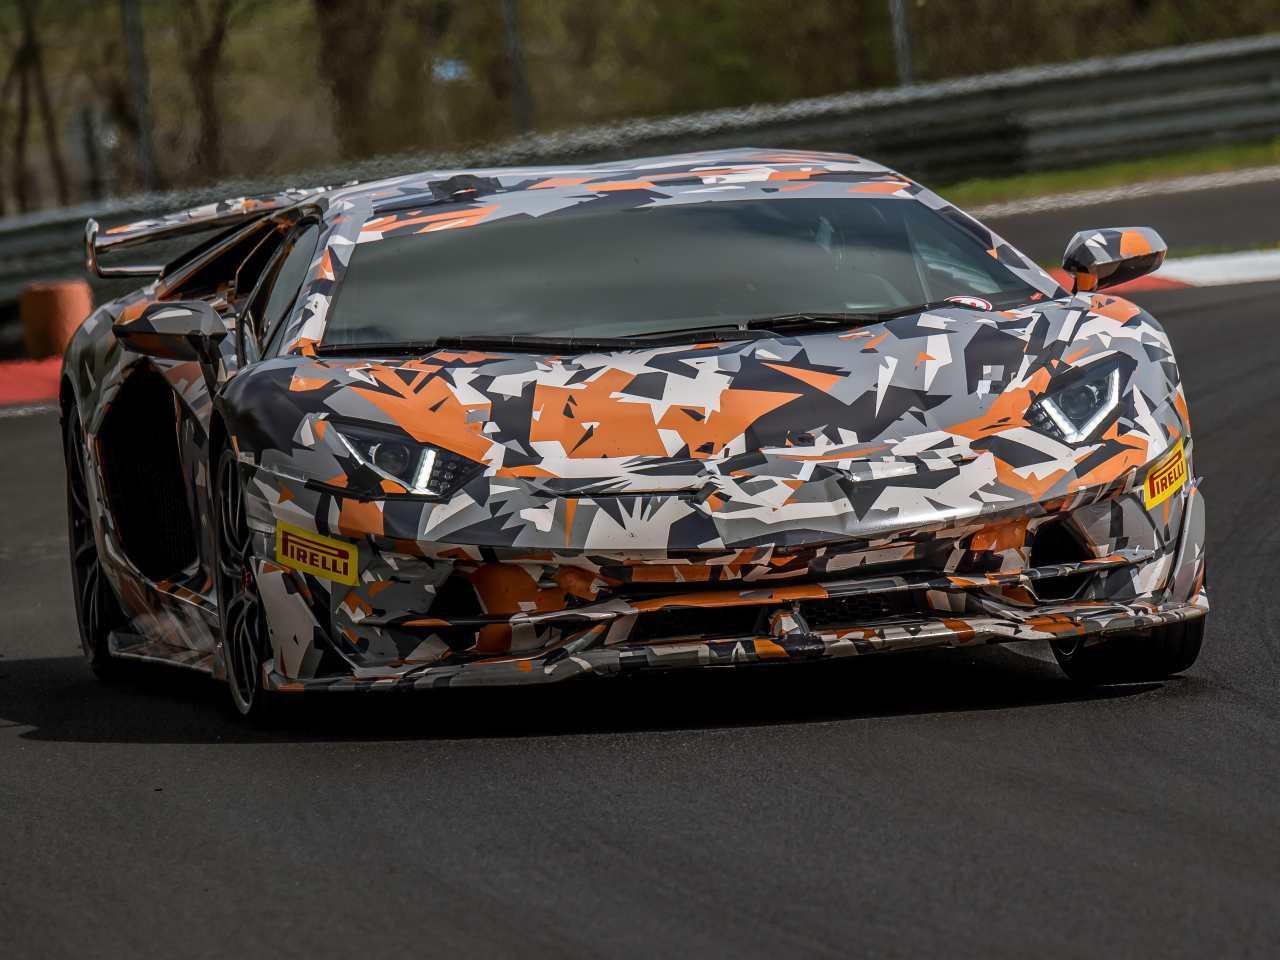 Bild zu Lamborghini Aventador SVJ